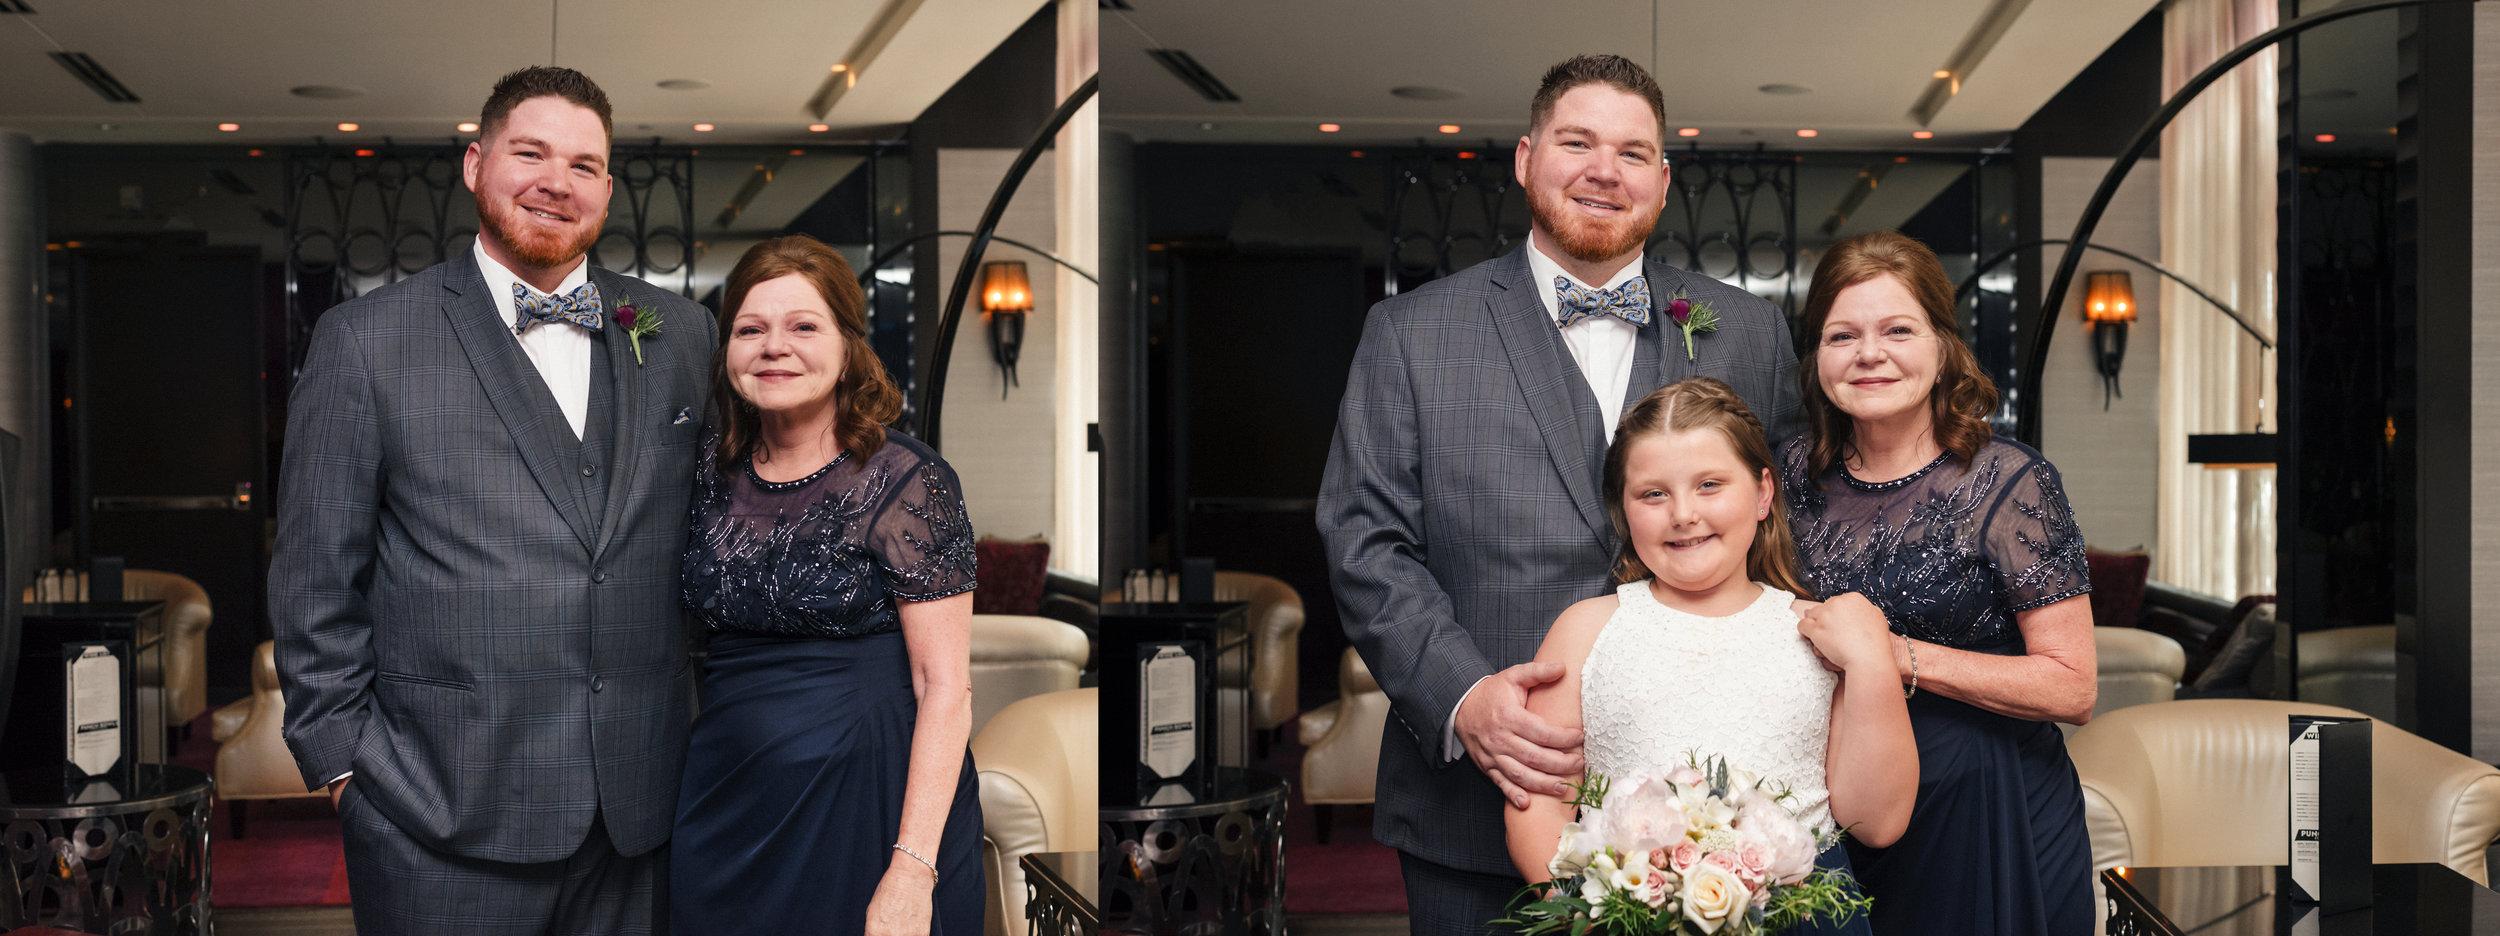 Shawn & Family.jpg